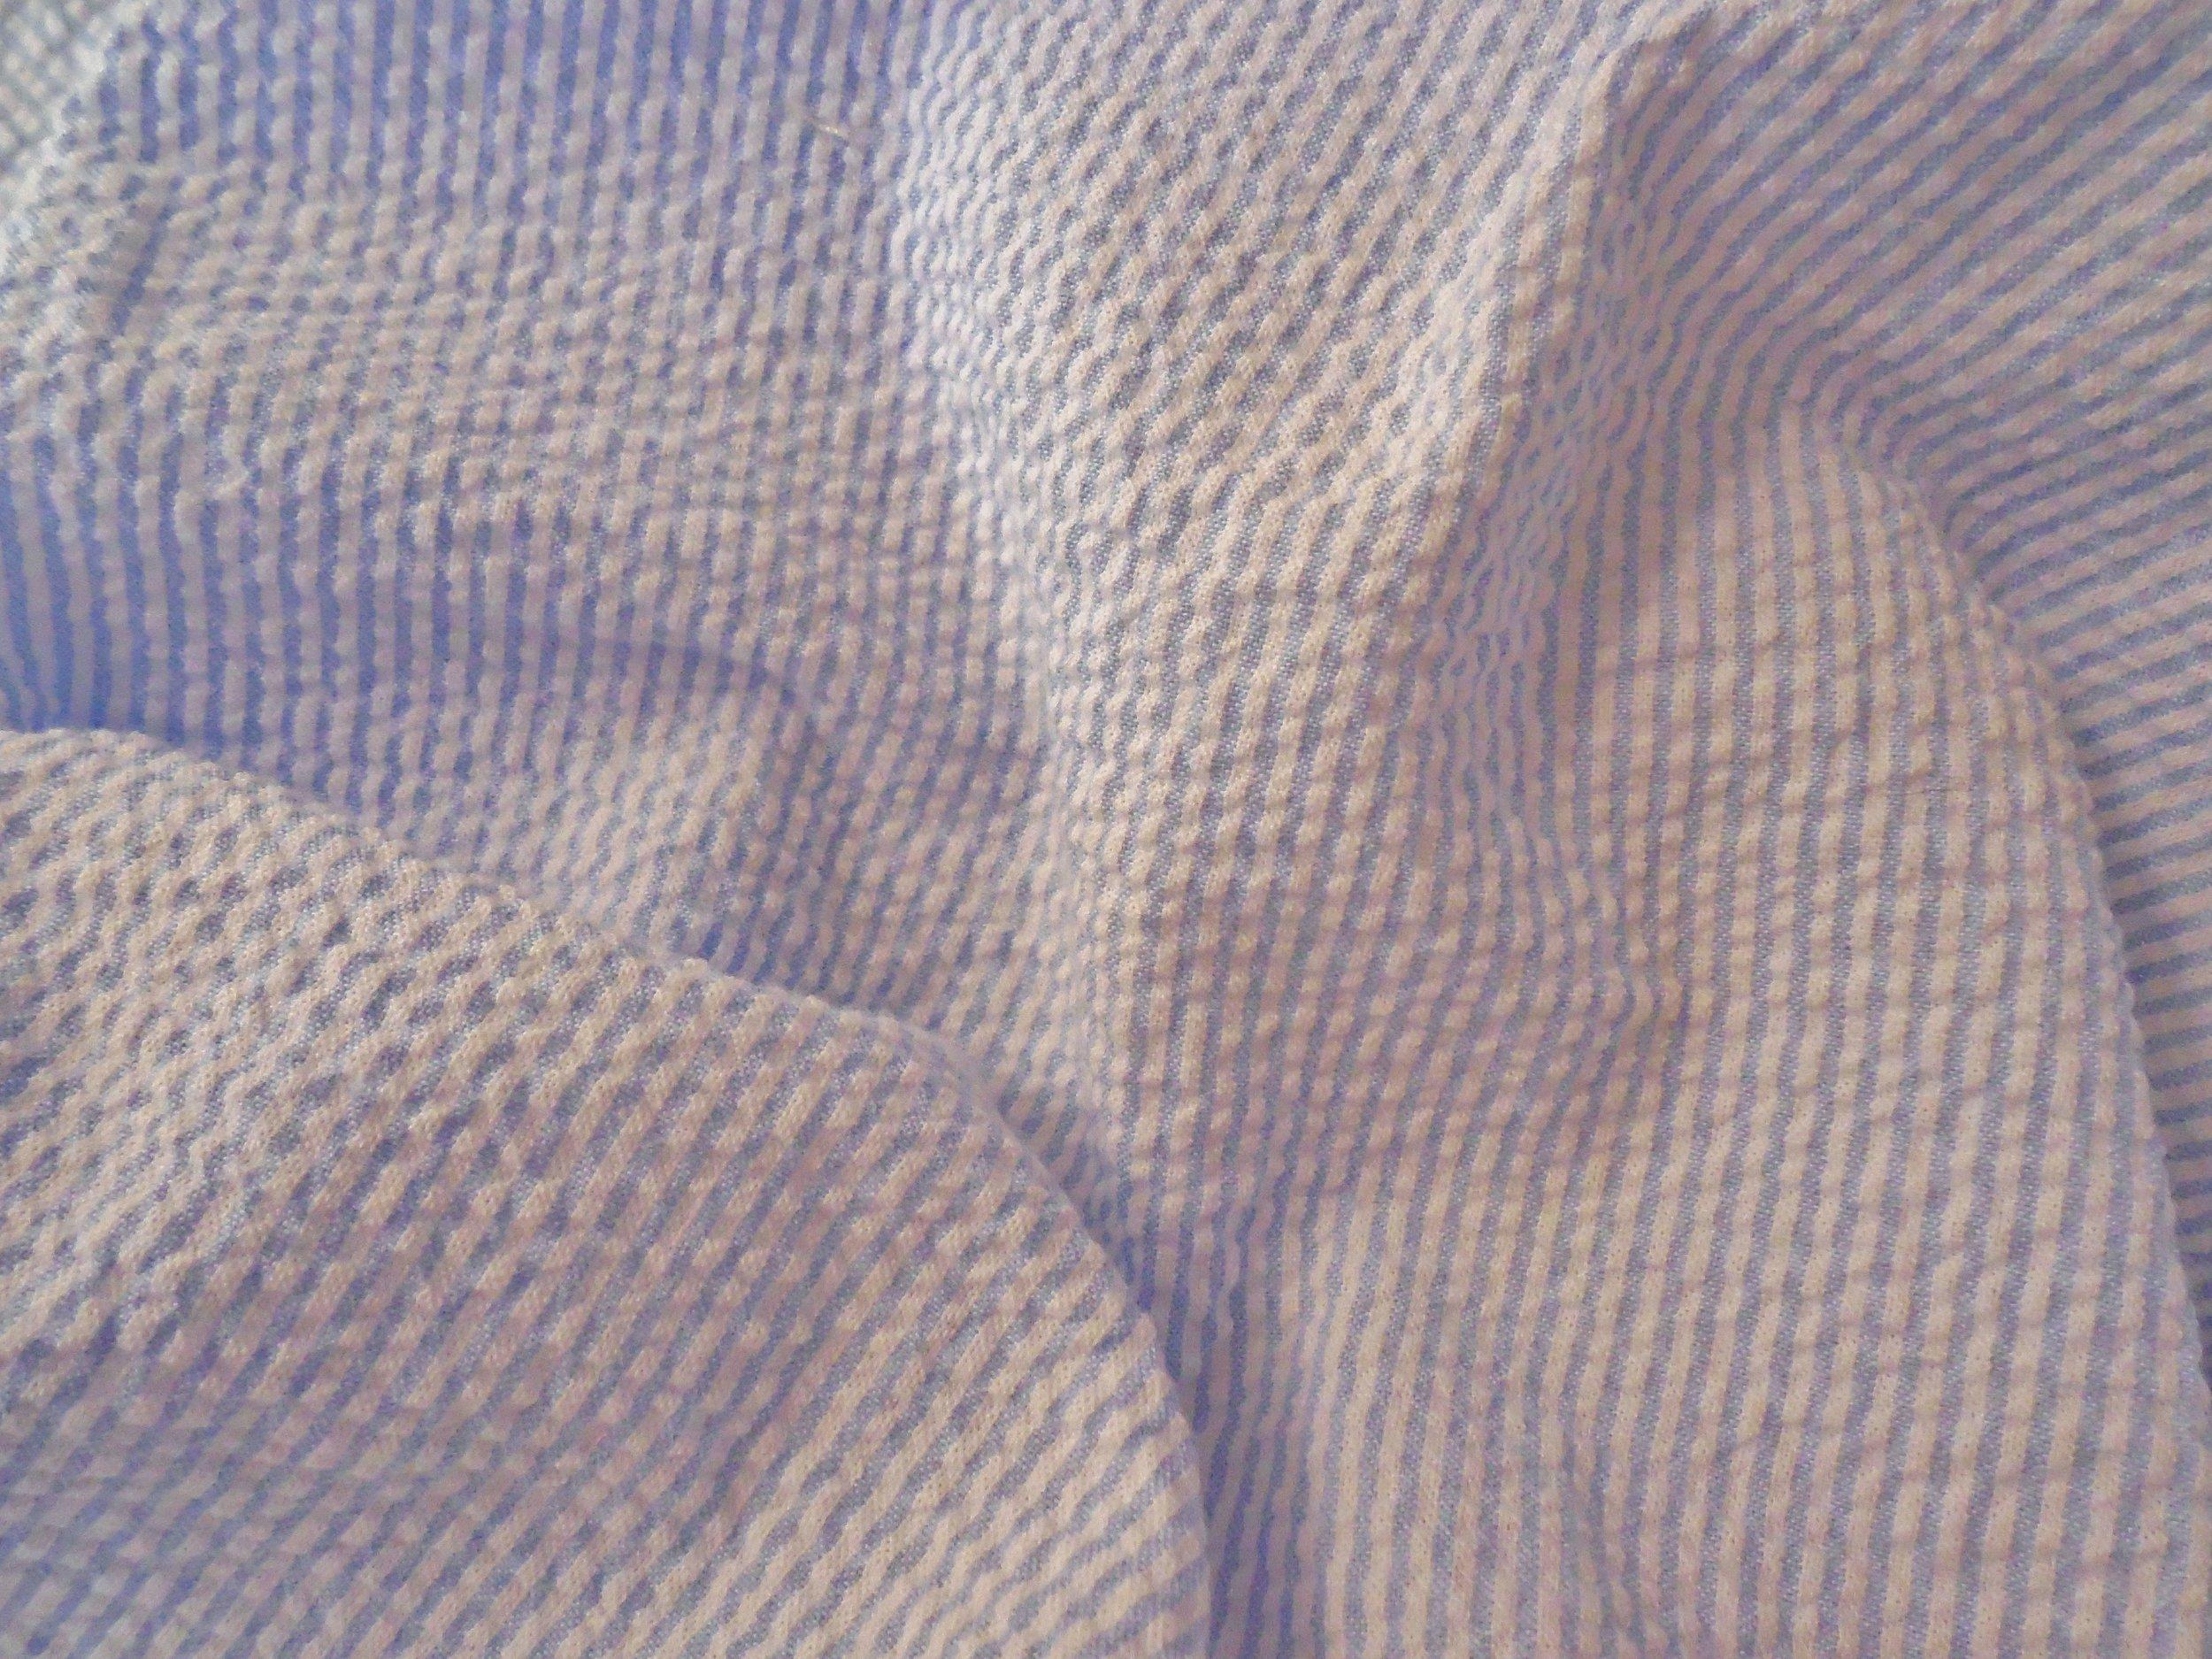 fabric - DSCN3130 - Copy.JPG